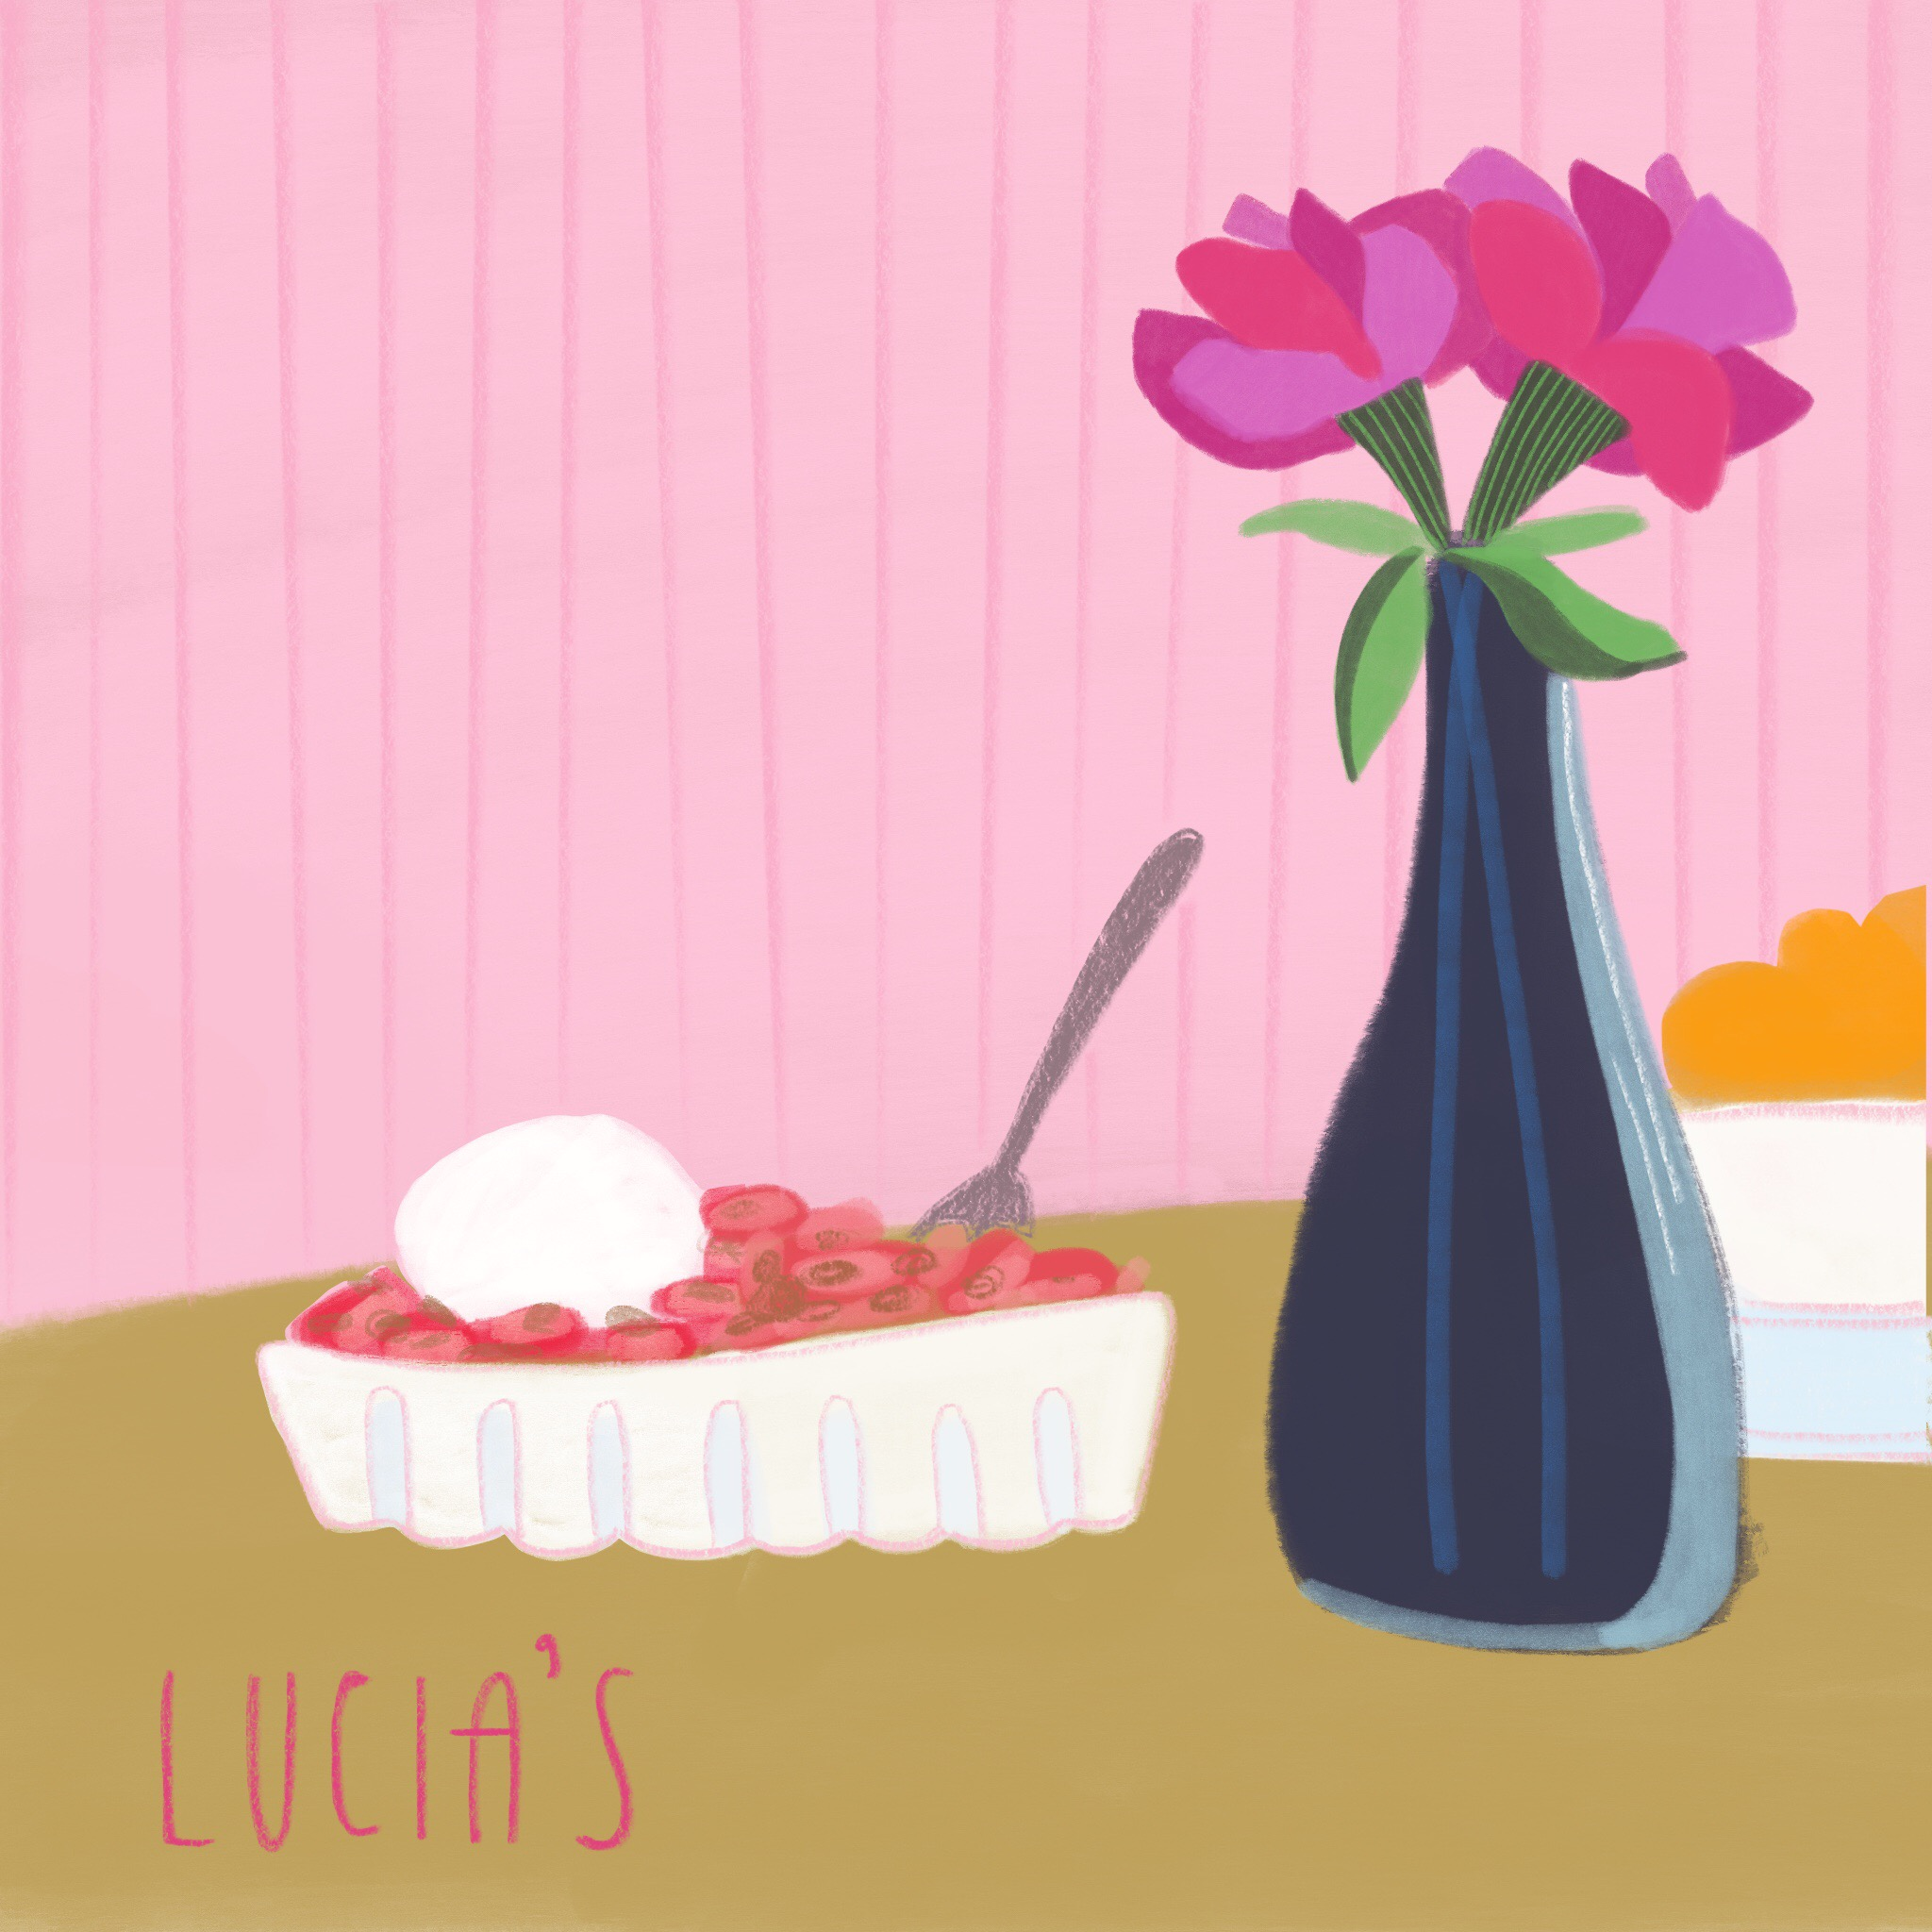 2_-_Lucia's (1).jpg